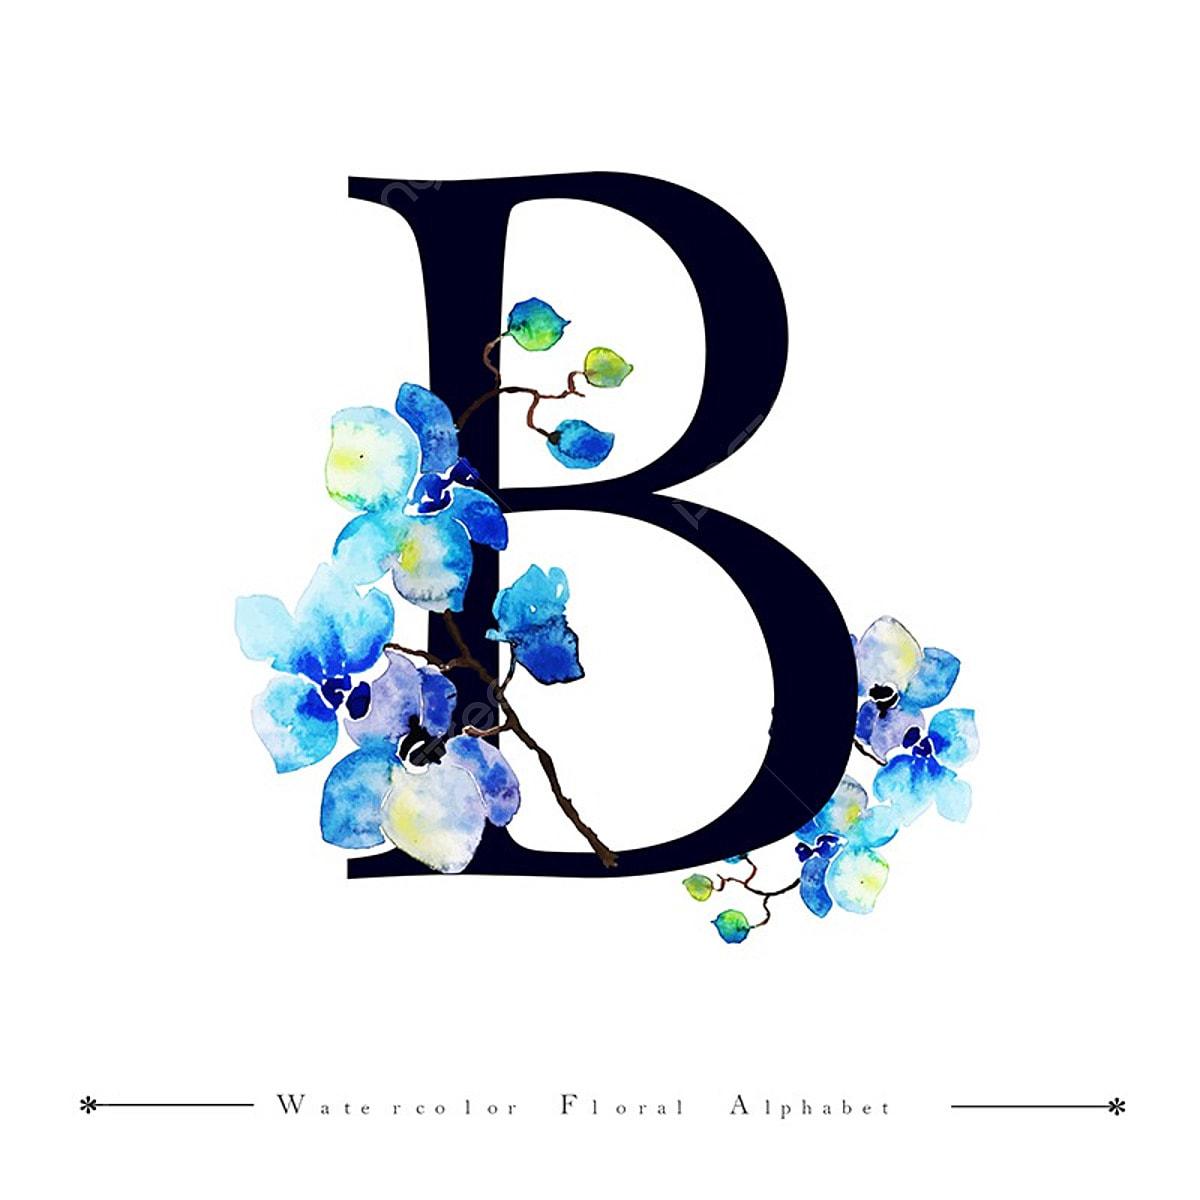 B Alphabet Letter Watercolor Floral Background, Watercolor